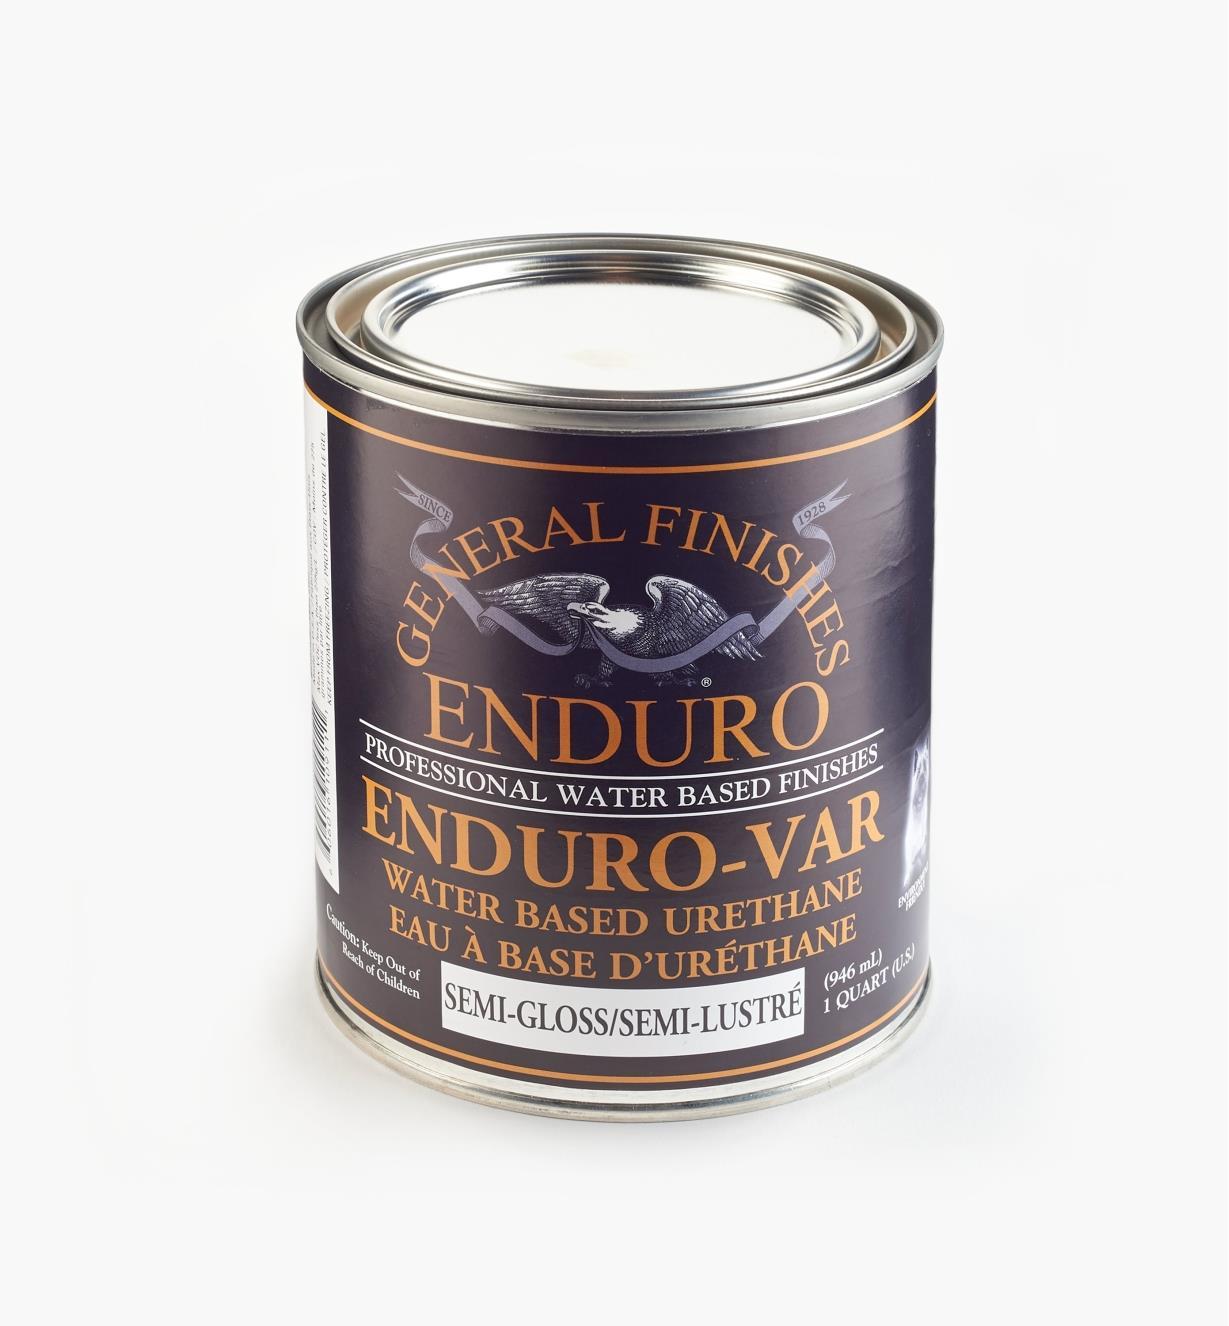 56Z1625 - Semi-Gloss Enduro-Var Water-Based Varnish, 1 qt (946ml)